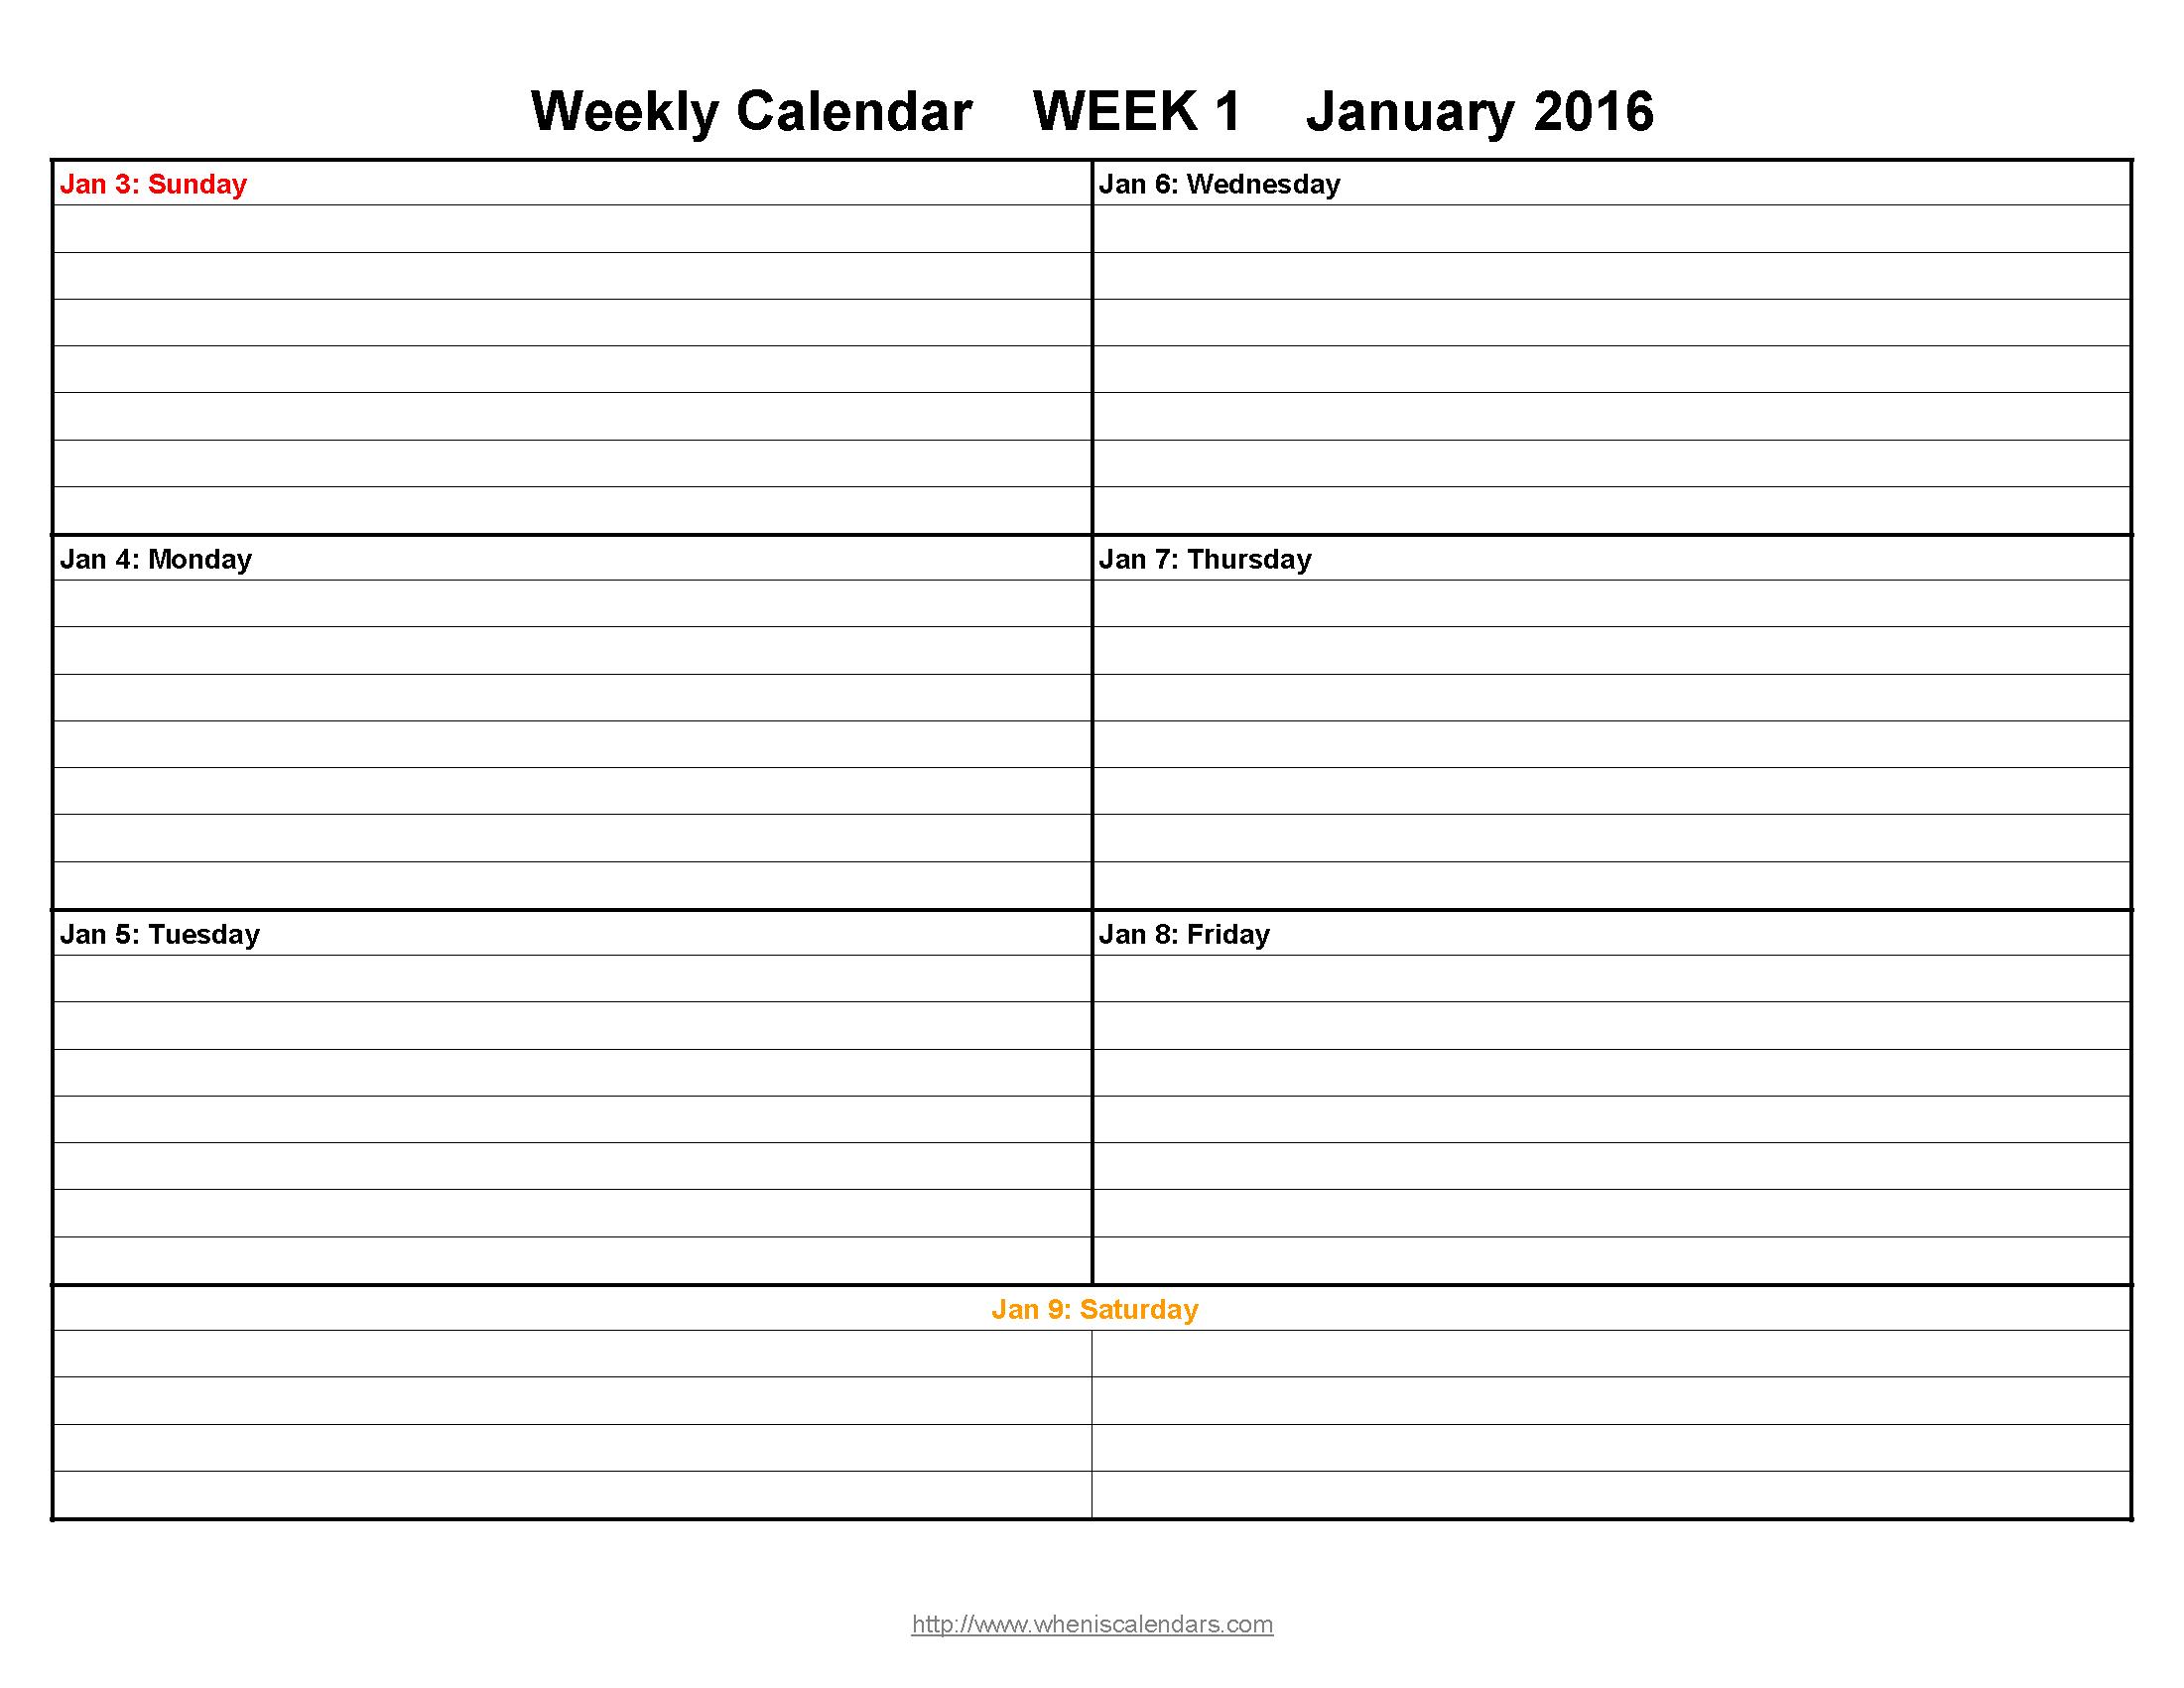 Printable Weekly Calendar 2016 When is Calendar